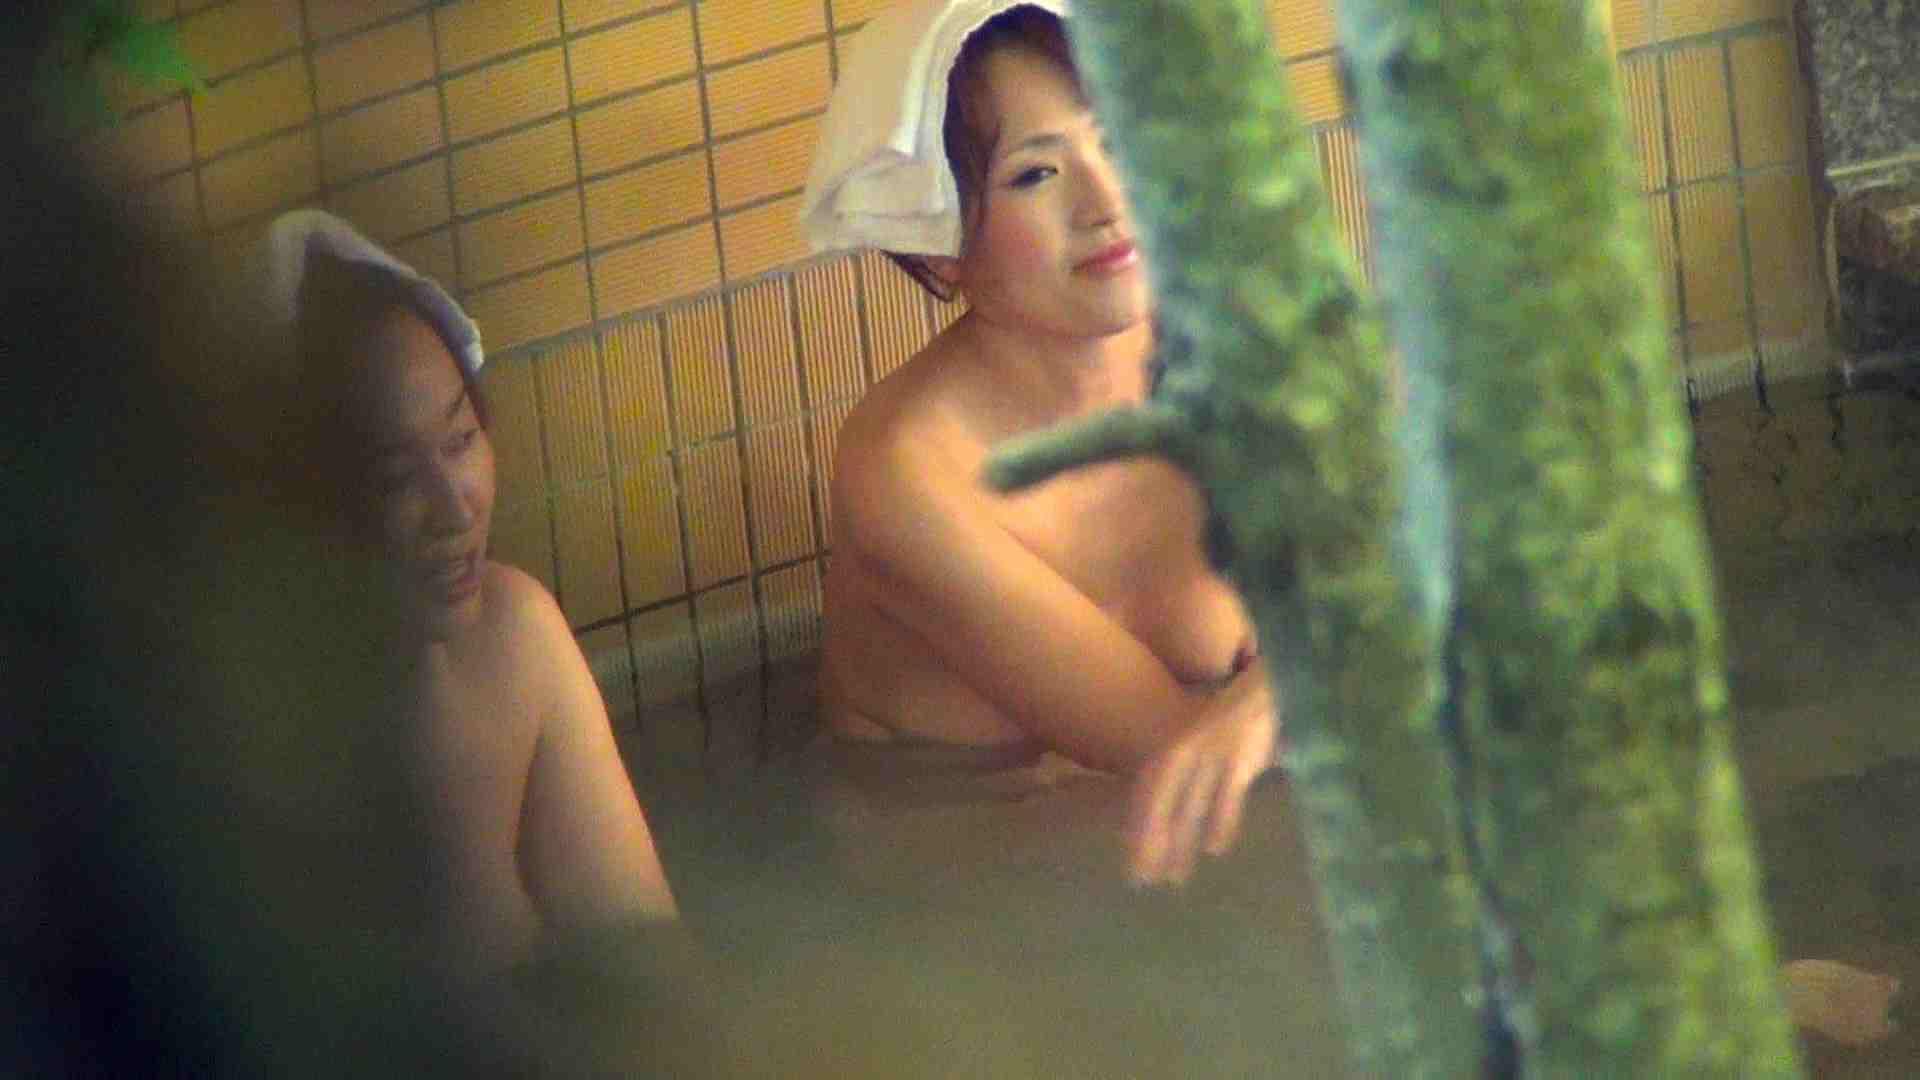 Aquaな露天風呂Vol.272 0   0  75連発 45